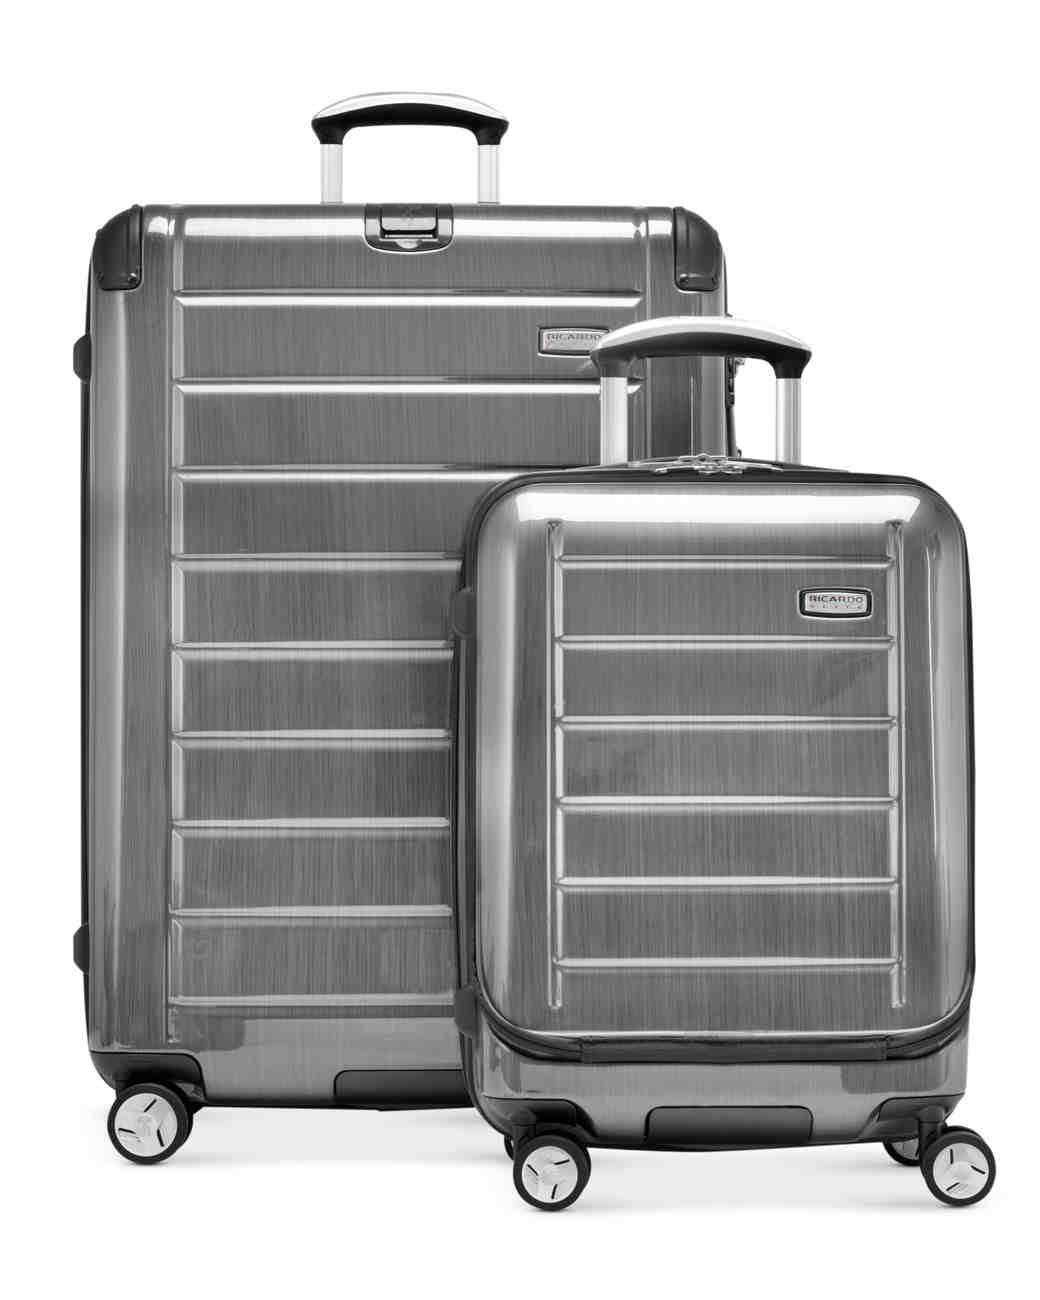 macys-registry-4-ricardo-roxbury-luggage-0115.jpg